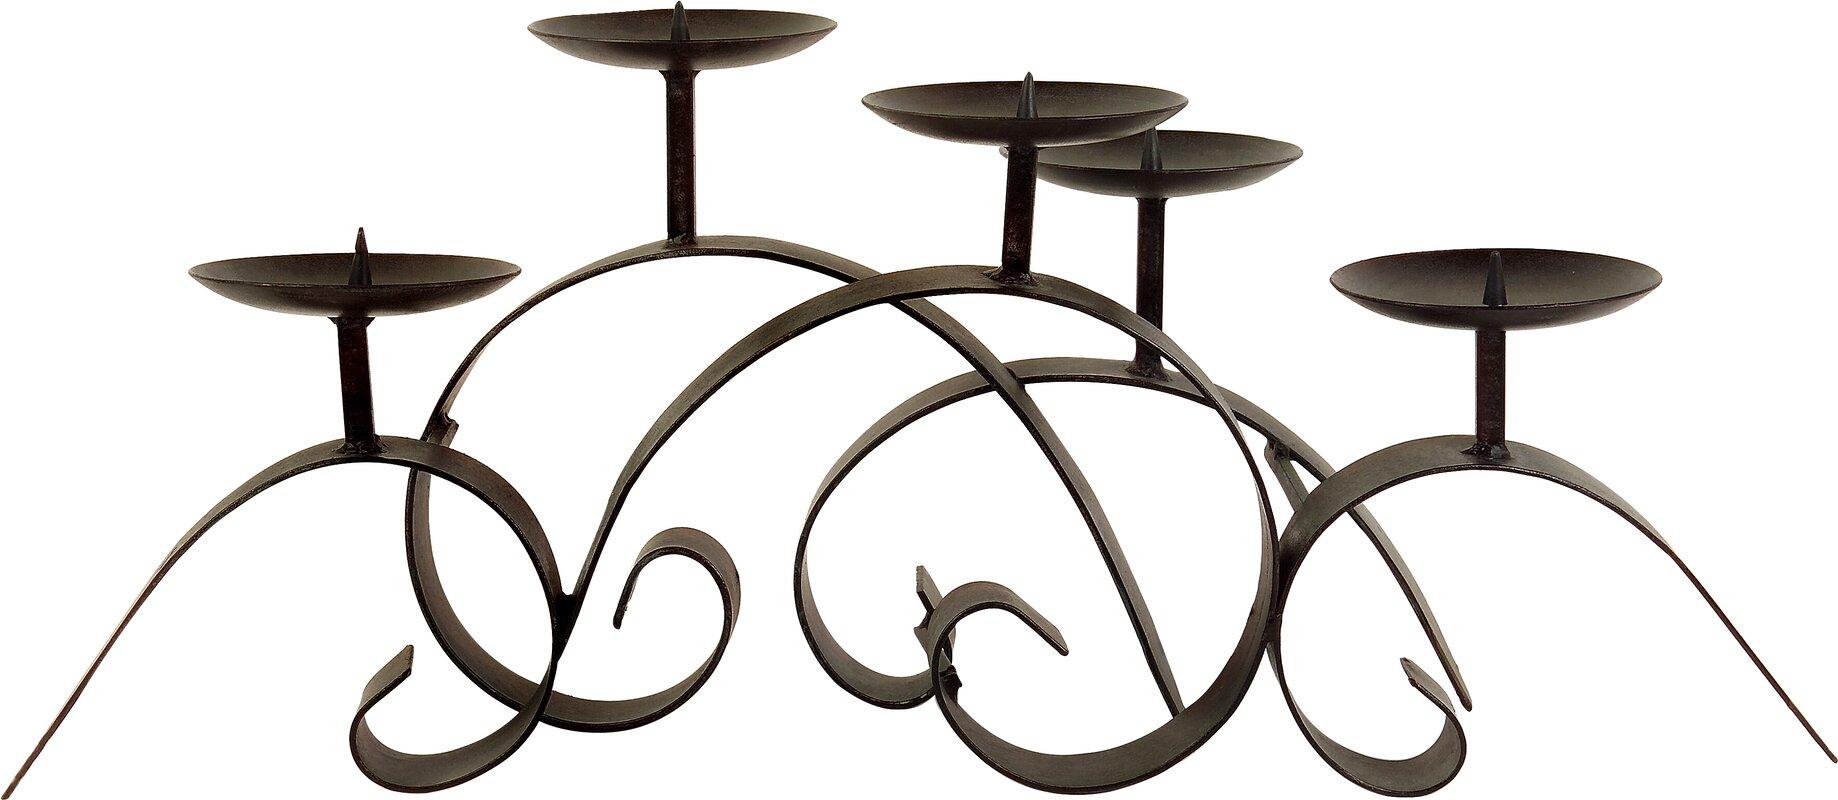 imax wrought iron centerpiece candelabra u0026 reviews wayfair